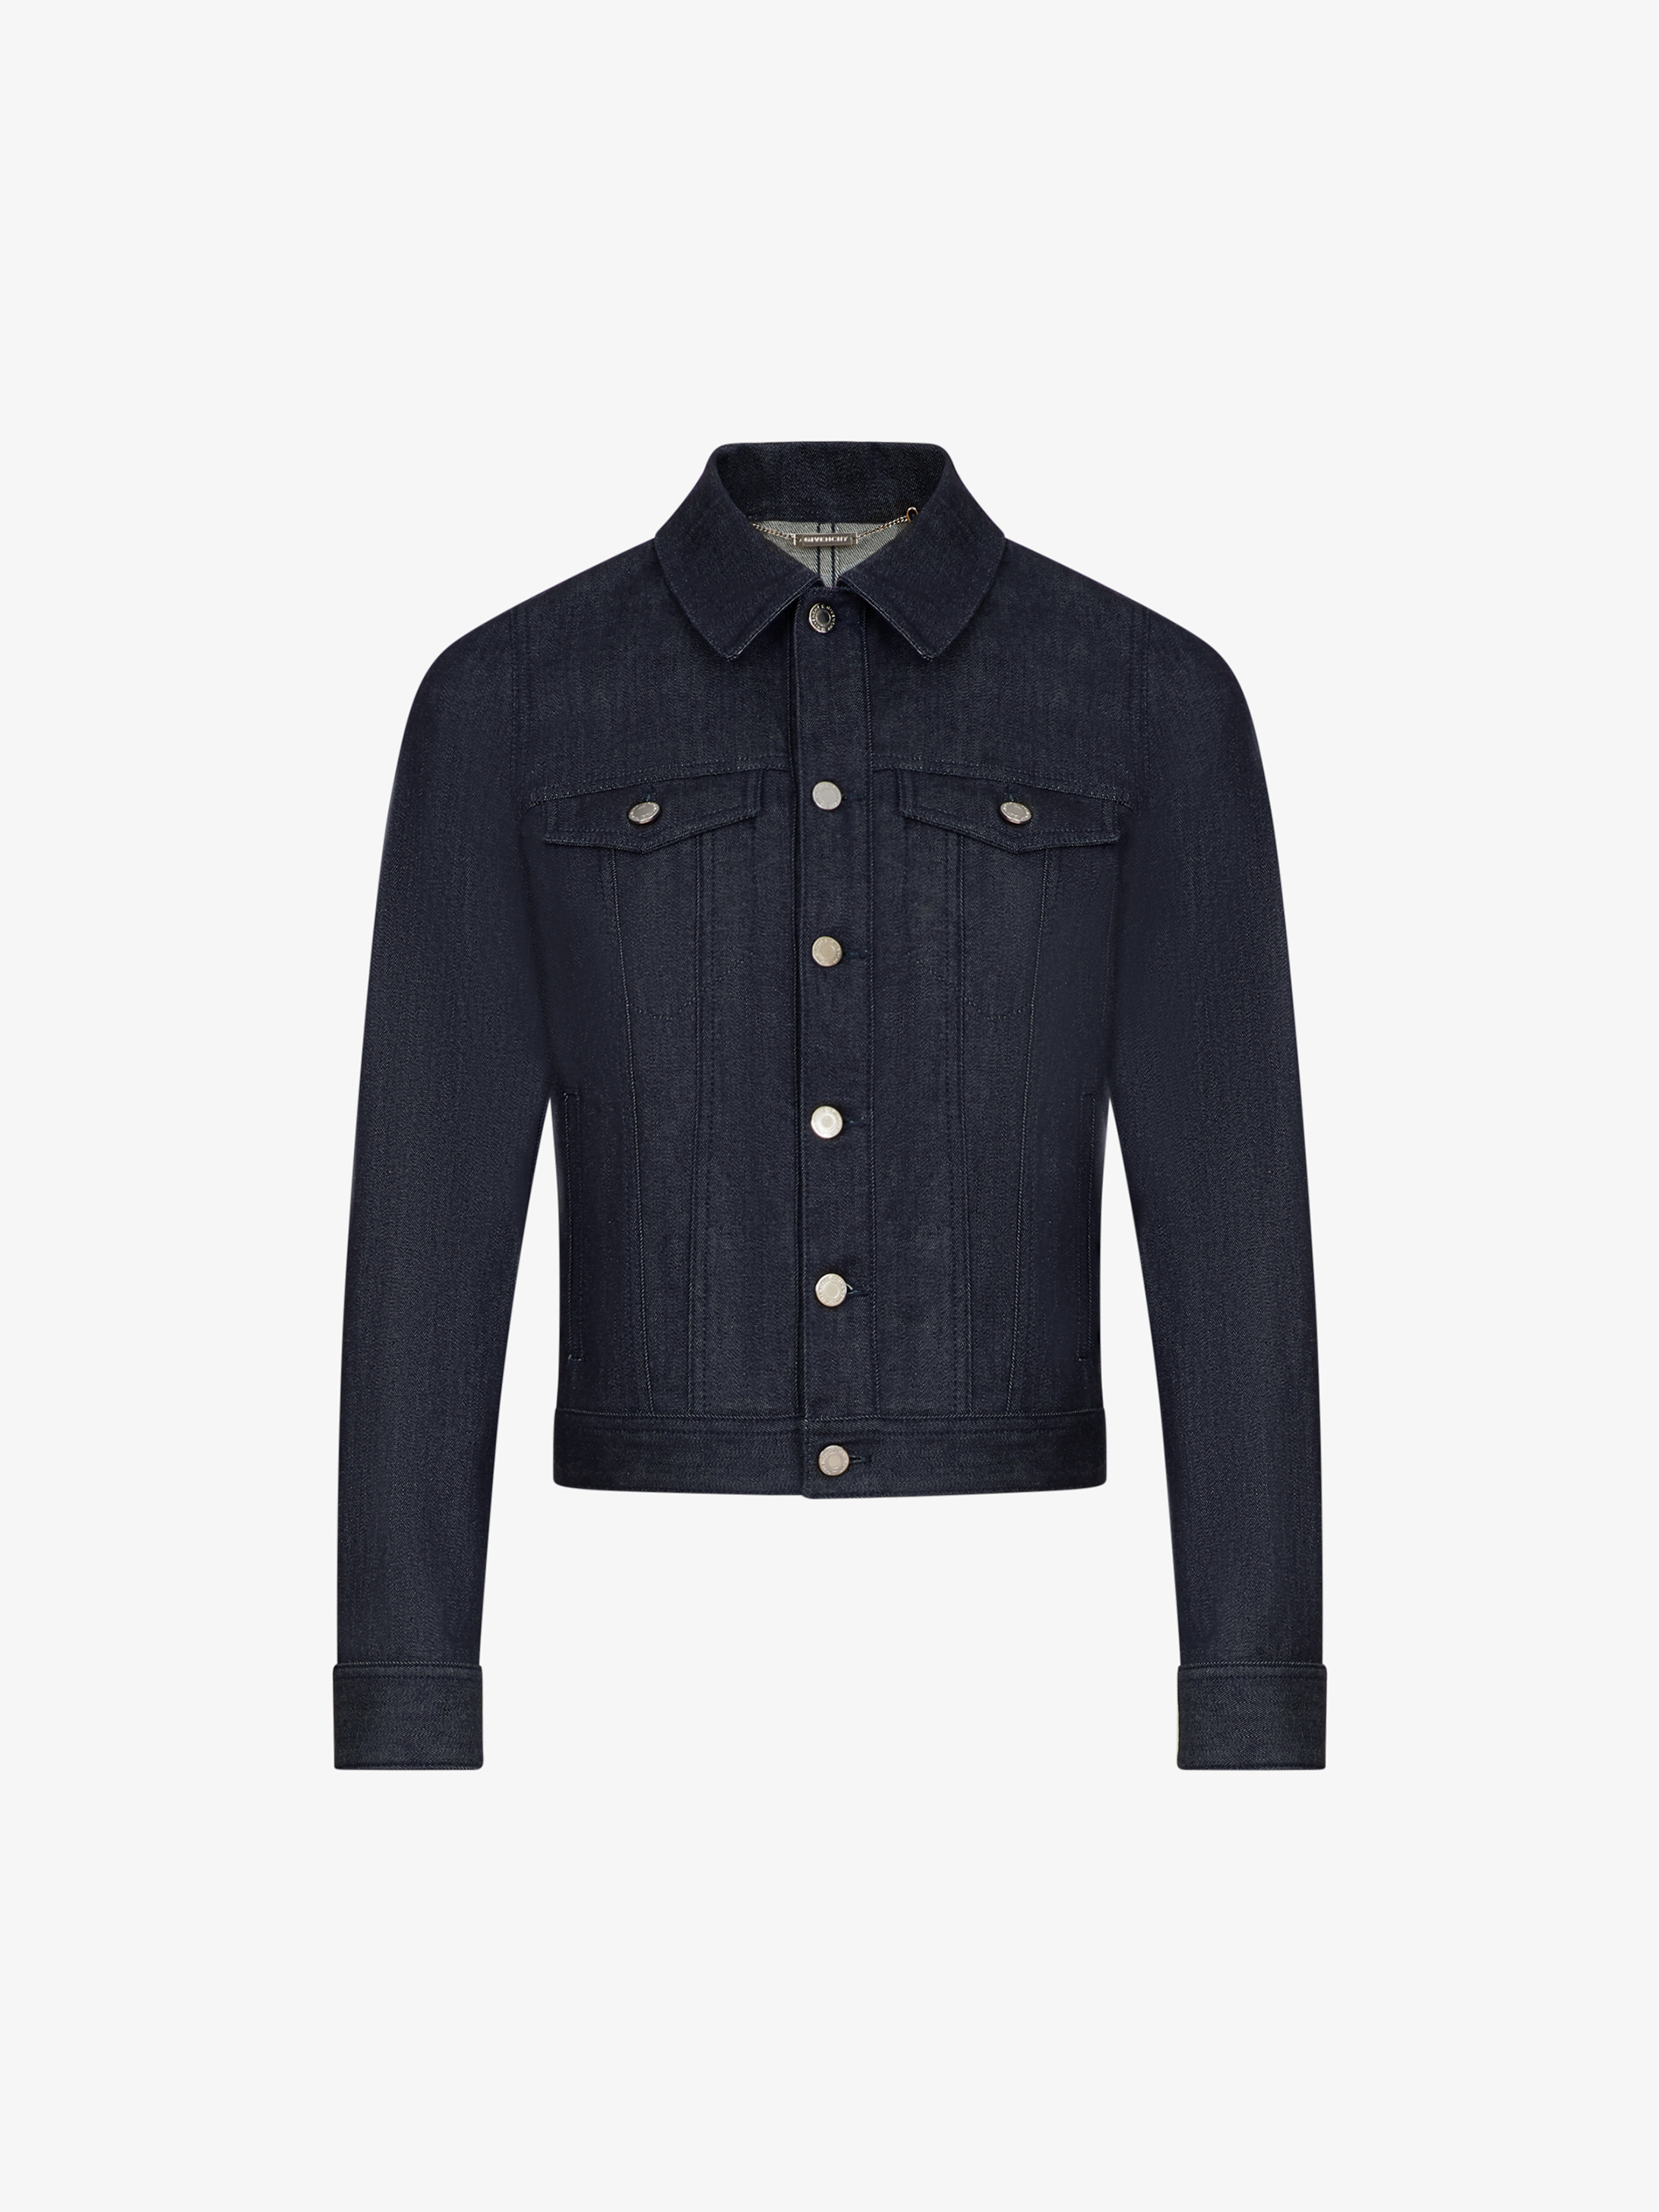 Onwijs GIVENCHY PARIS denim jacket | GIVENCHY Paris BO-03